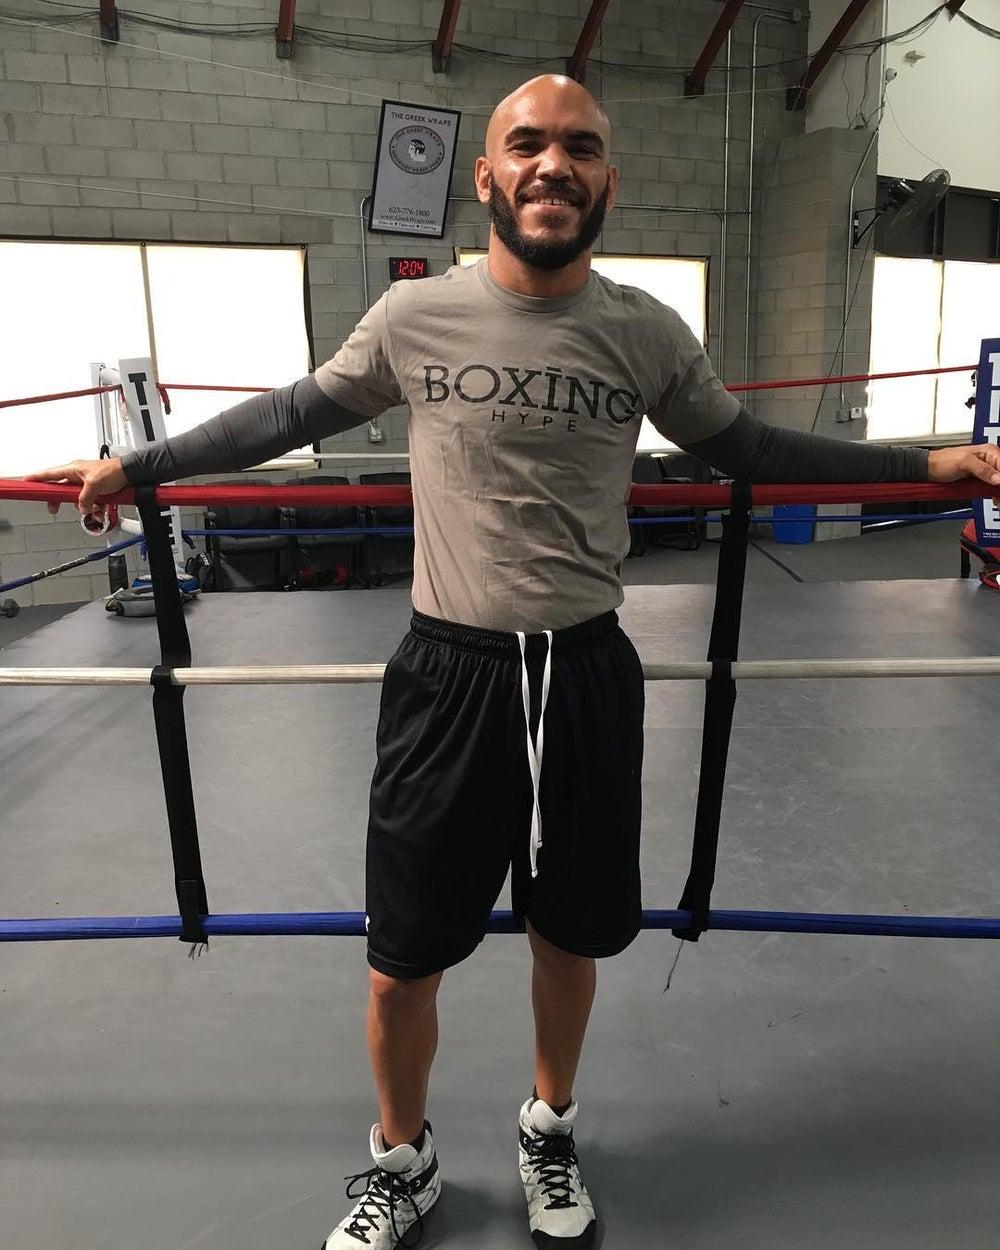 Image of Mens Gray BoxingHype CREWNECK tees